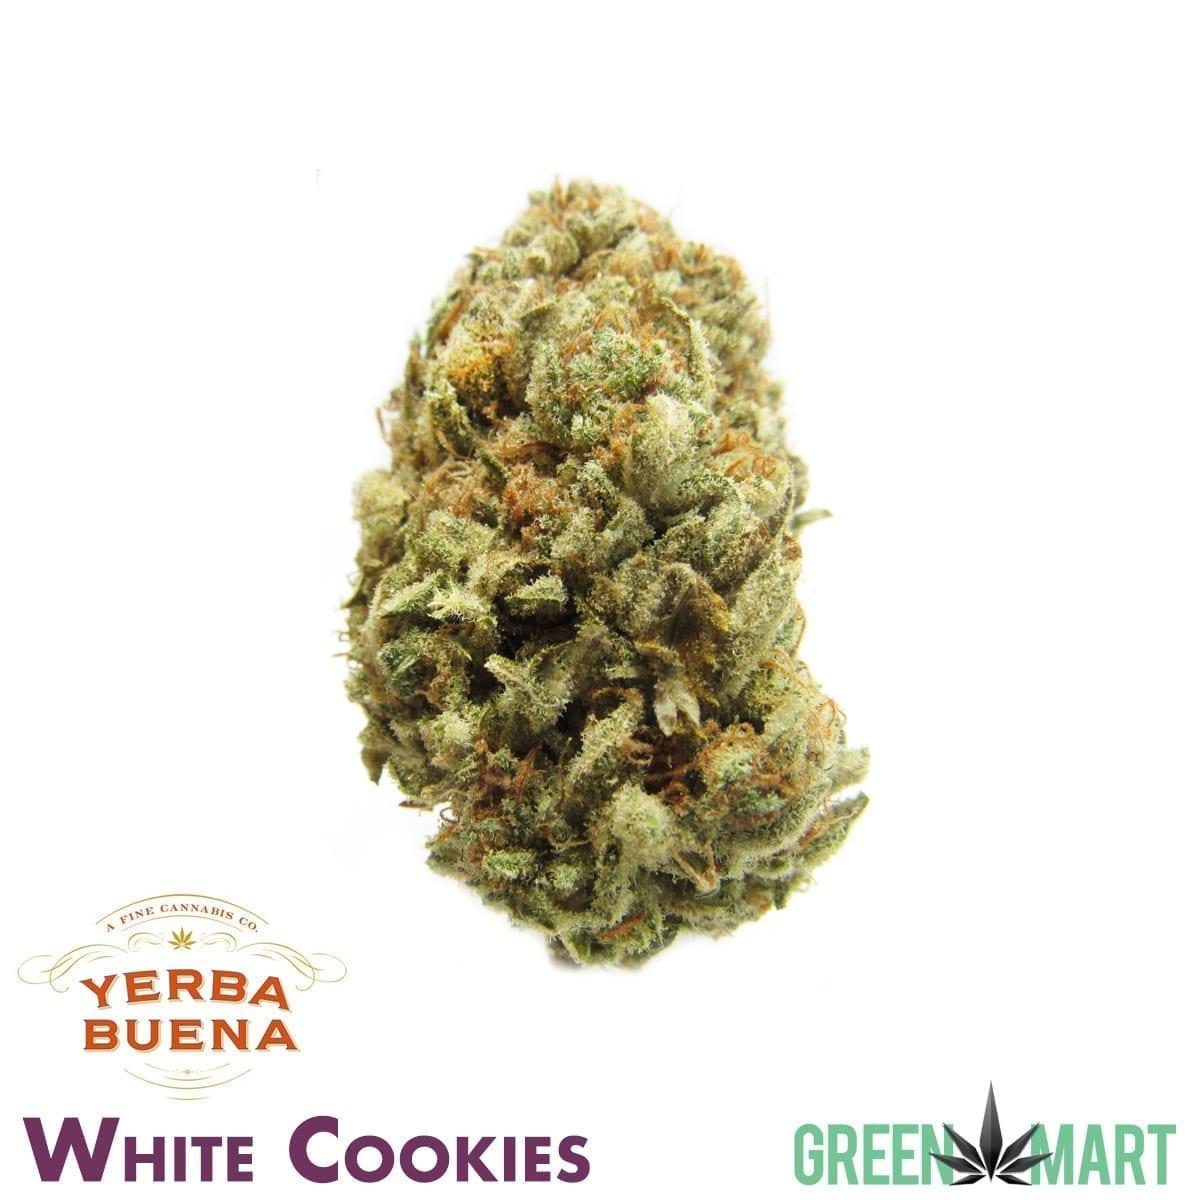 White Cookies by Yerba Buena